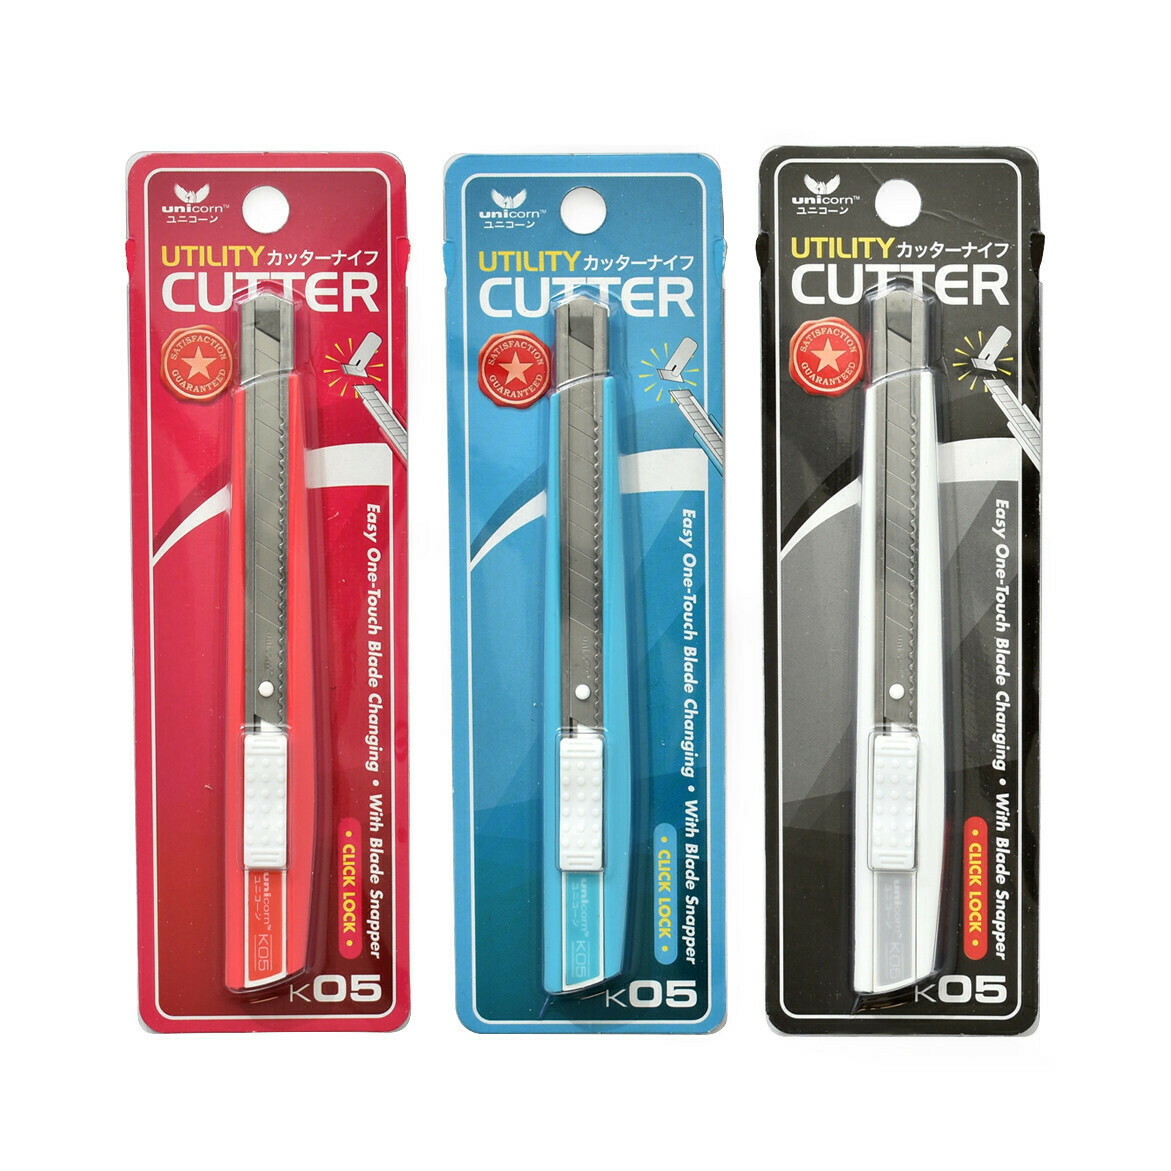 Unicorn Cutter DX-K05